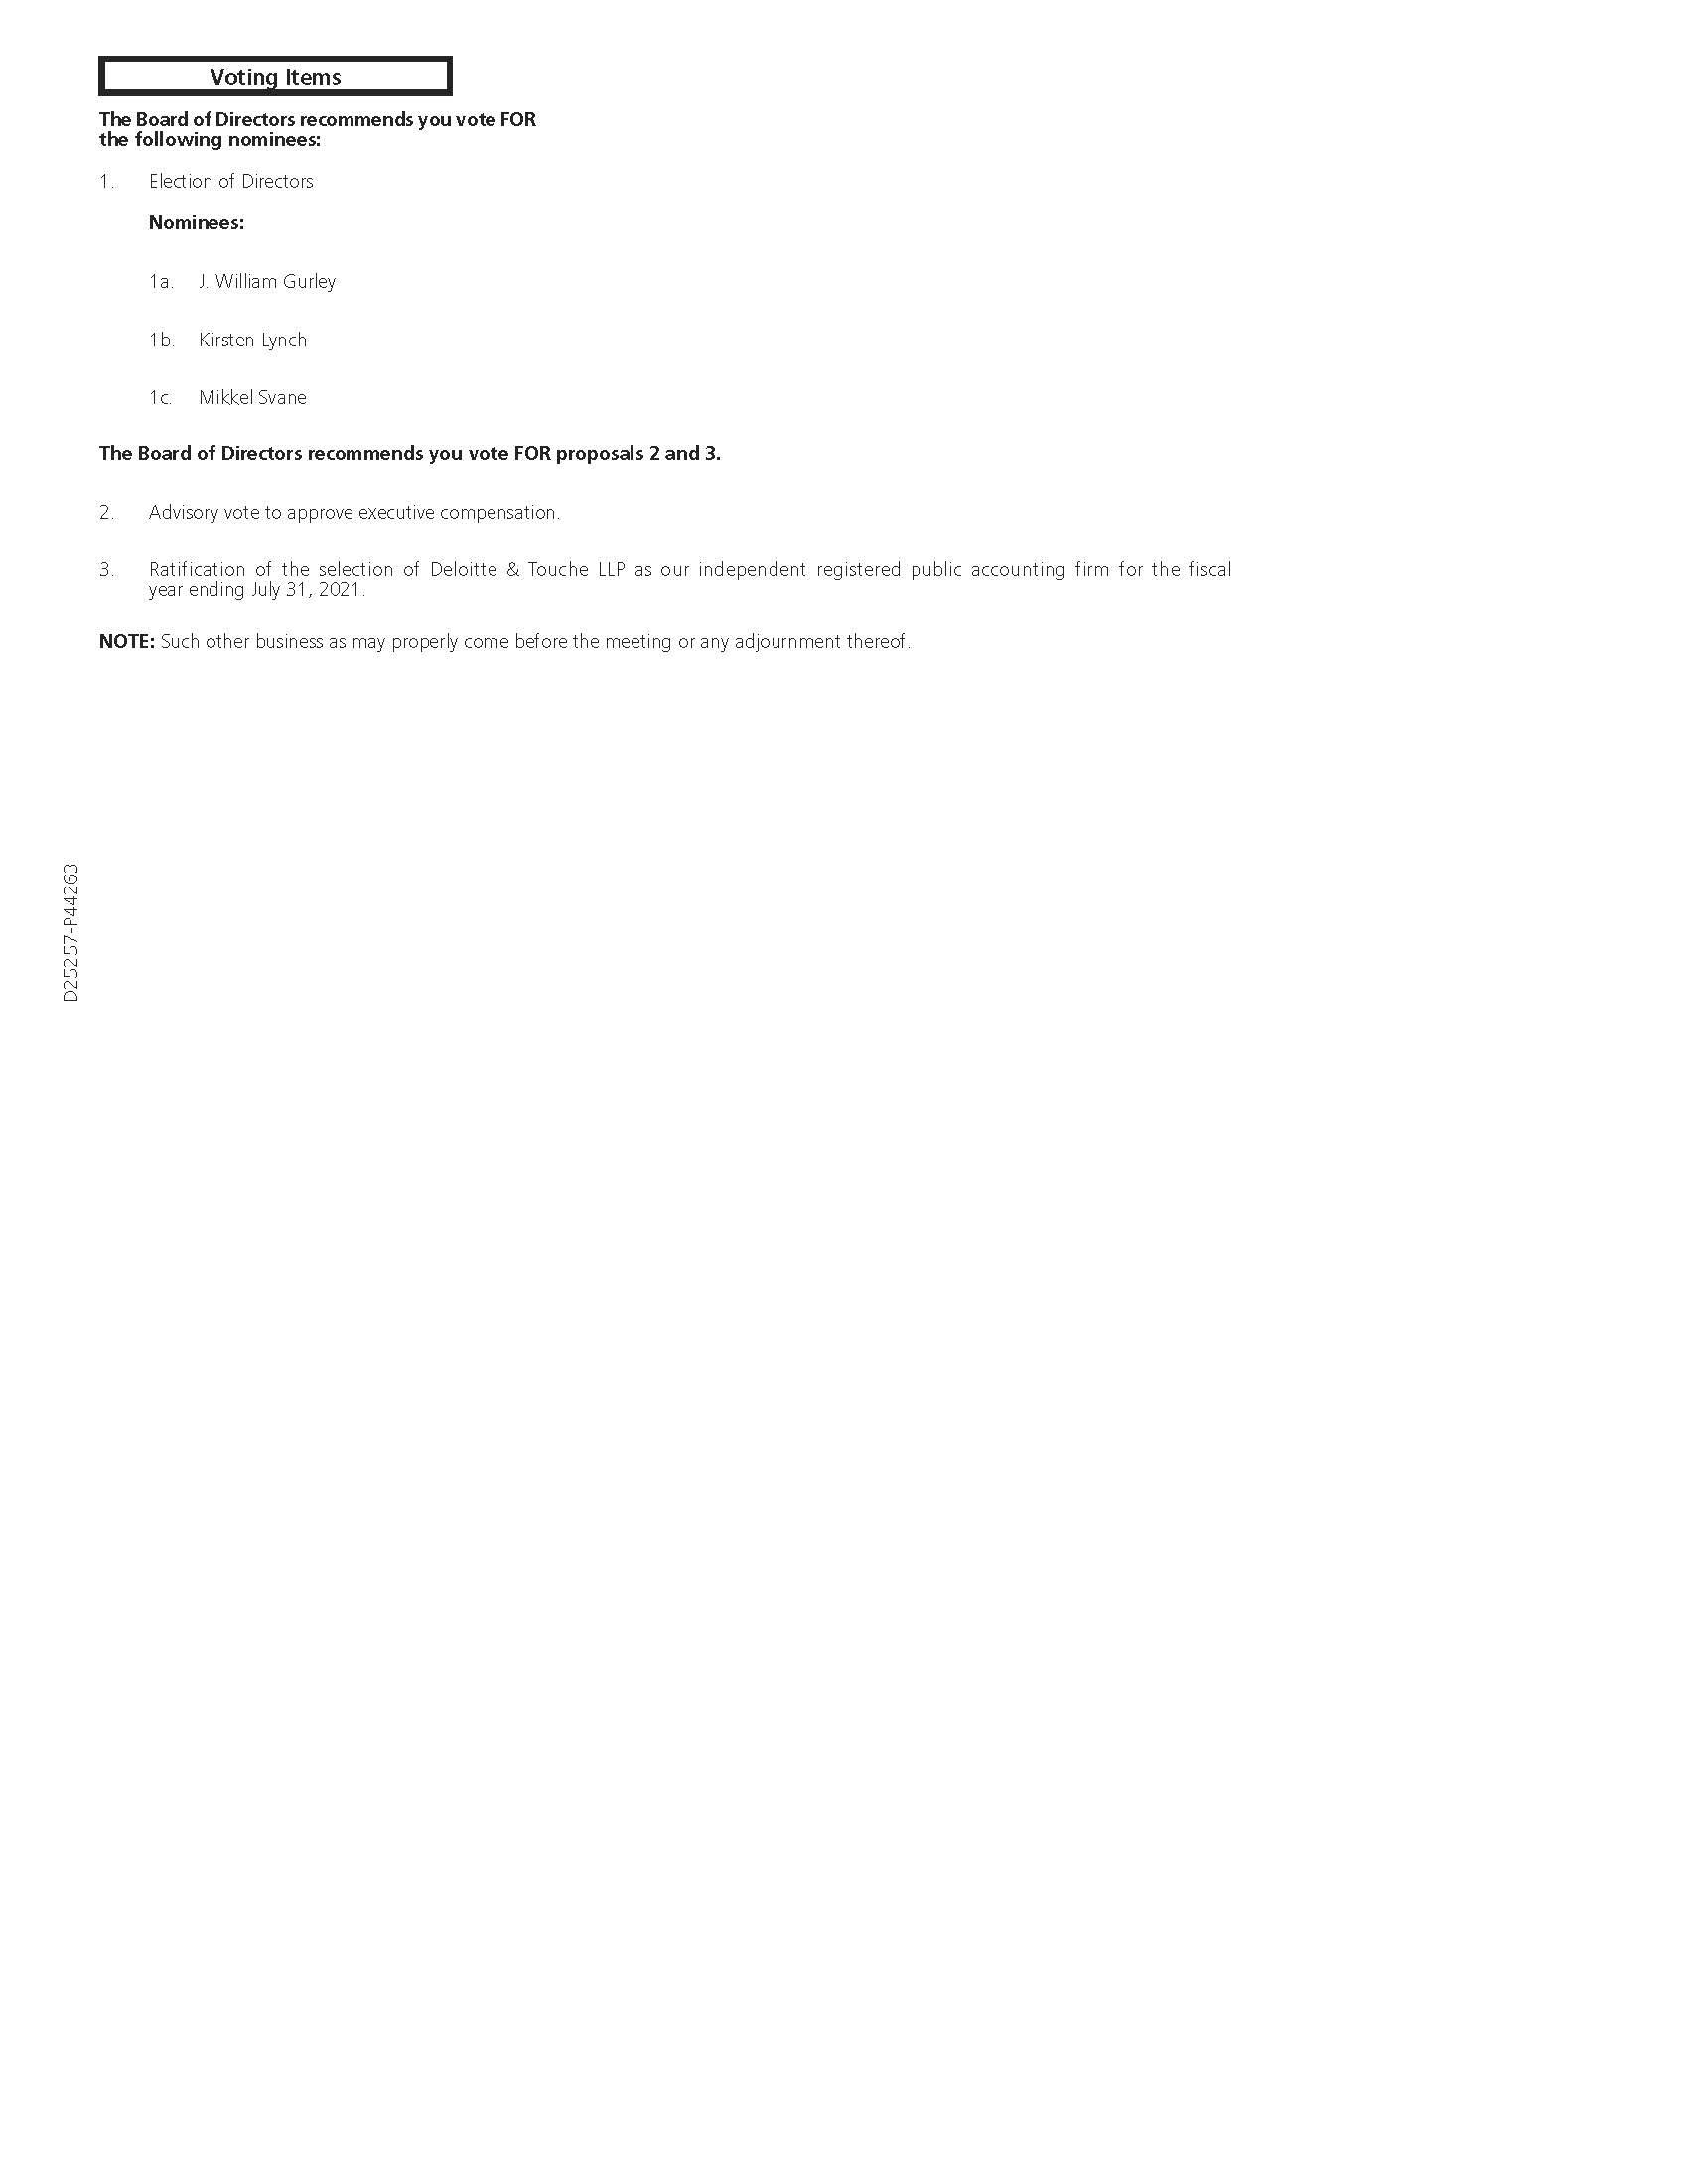 https://cdn.kscope.io/9588ec79b3f24f3c9cfa7665f19598cf-noticecardc1a.jpg